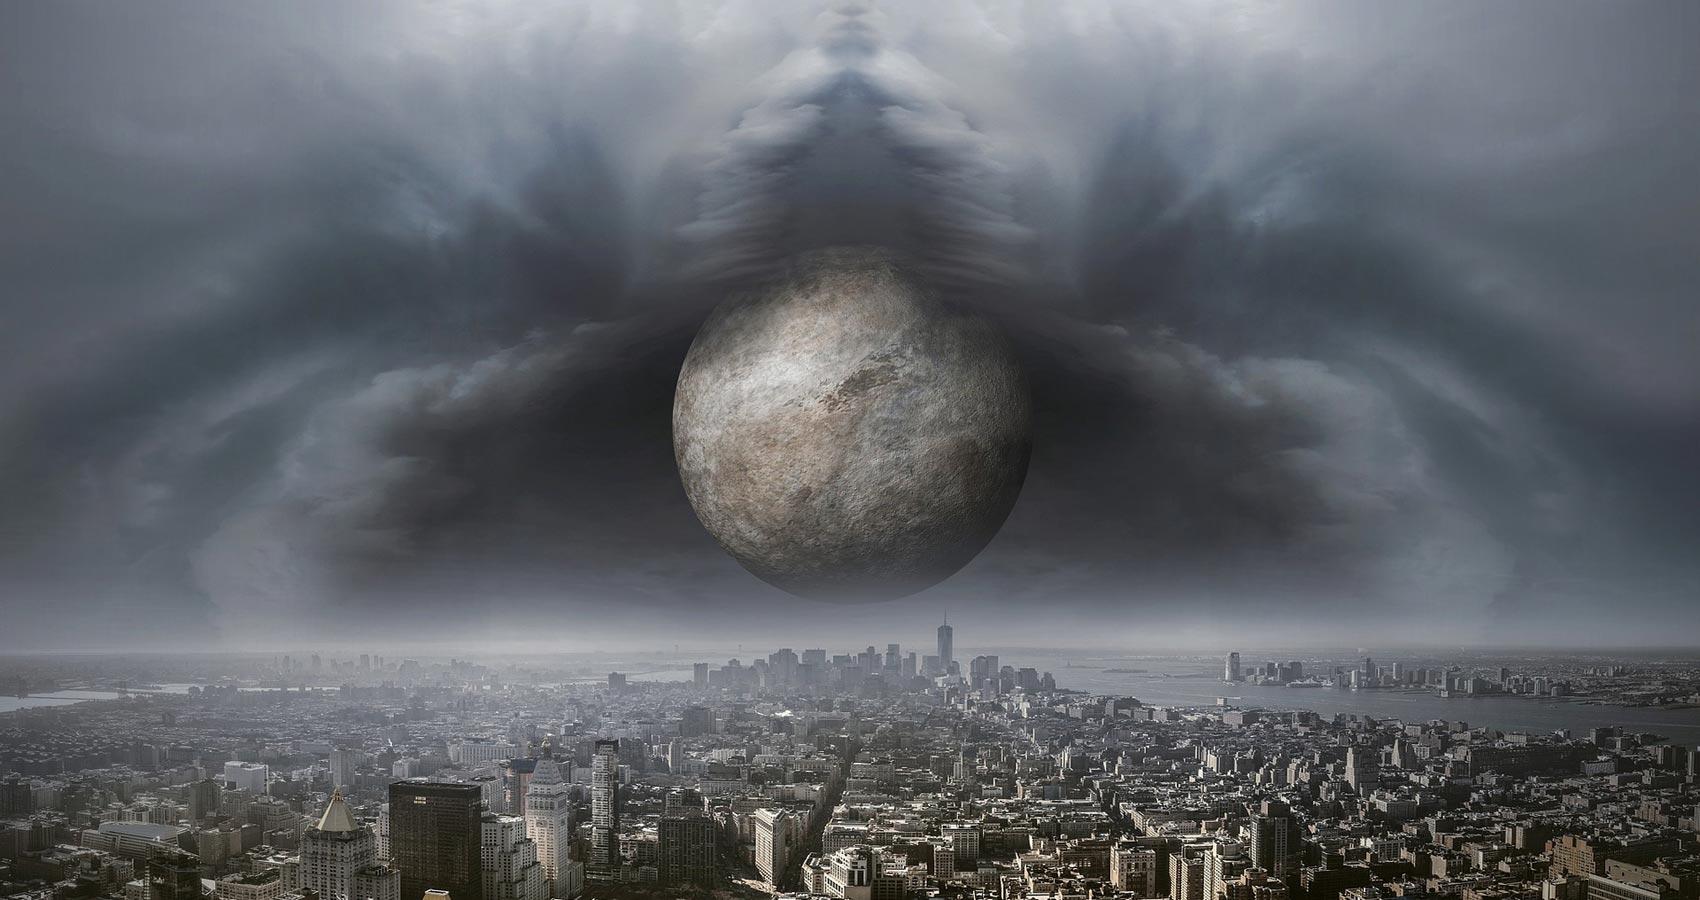 Apocalypse Fallen on Earth, prose by Garvit Jain at Spillwords.com